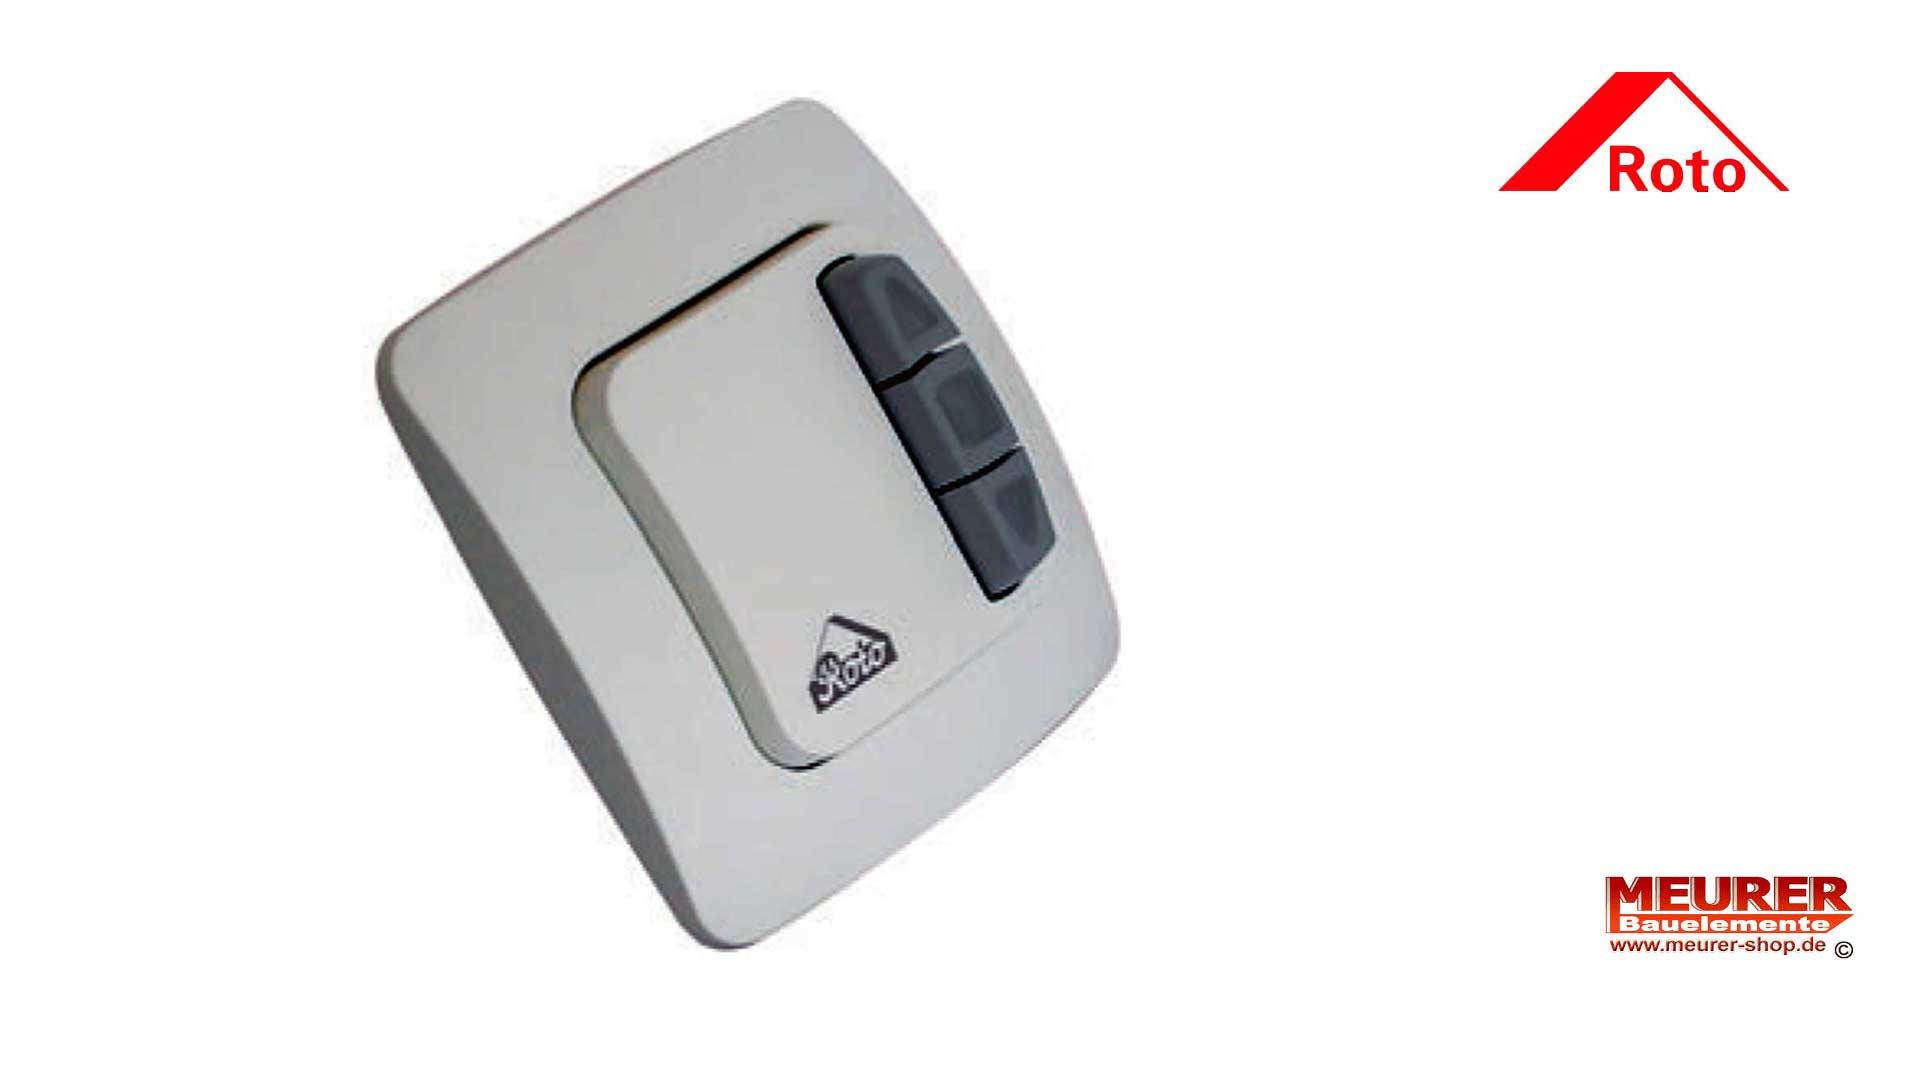 Roto Schalter 230 Volt-ZEL STG S 230V